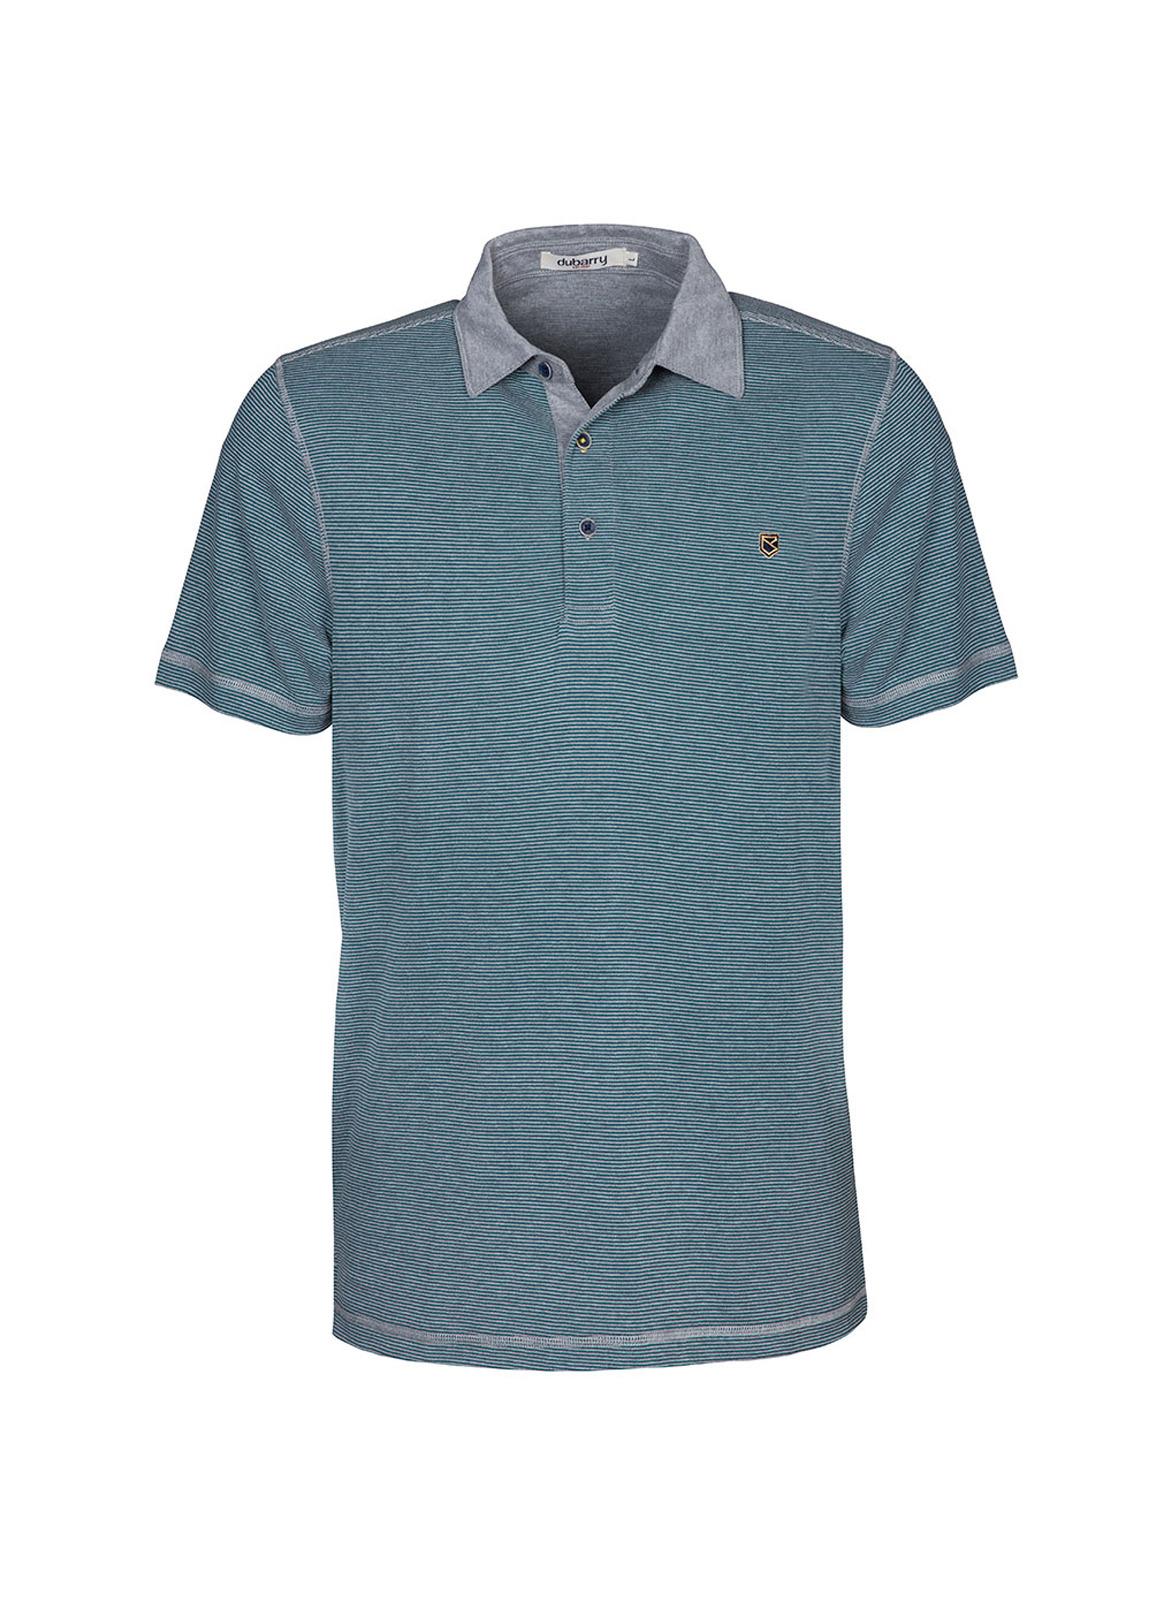 Dubarry_ Drumcliff Polo Shirt - Sorrel_Image_2